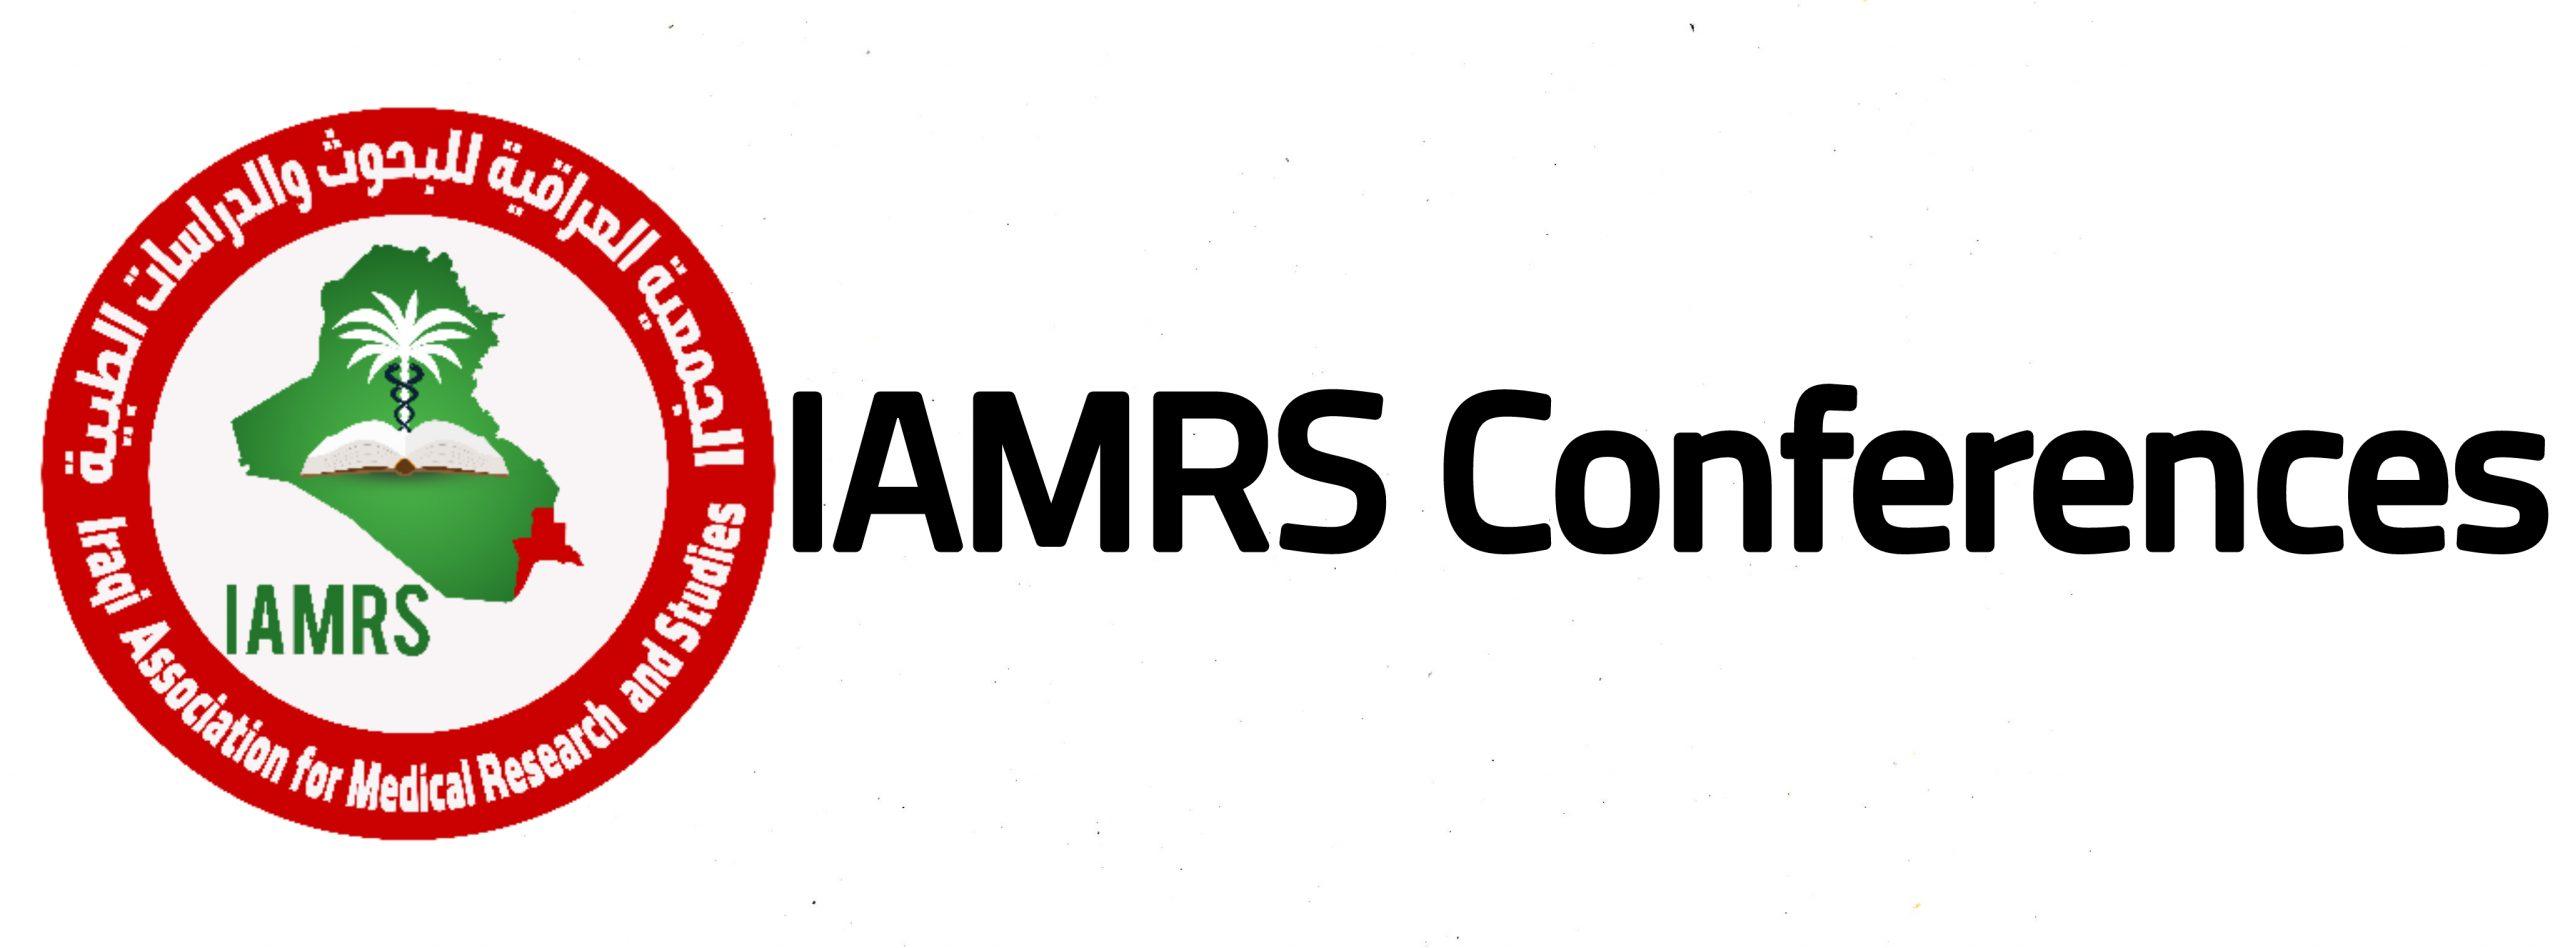 IAMRS Conferences